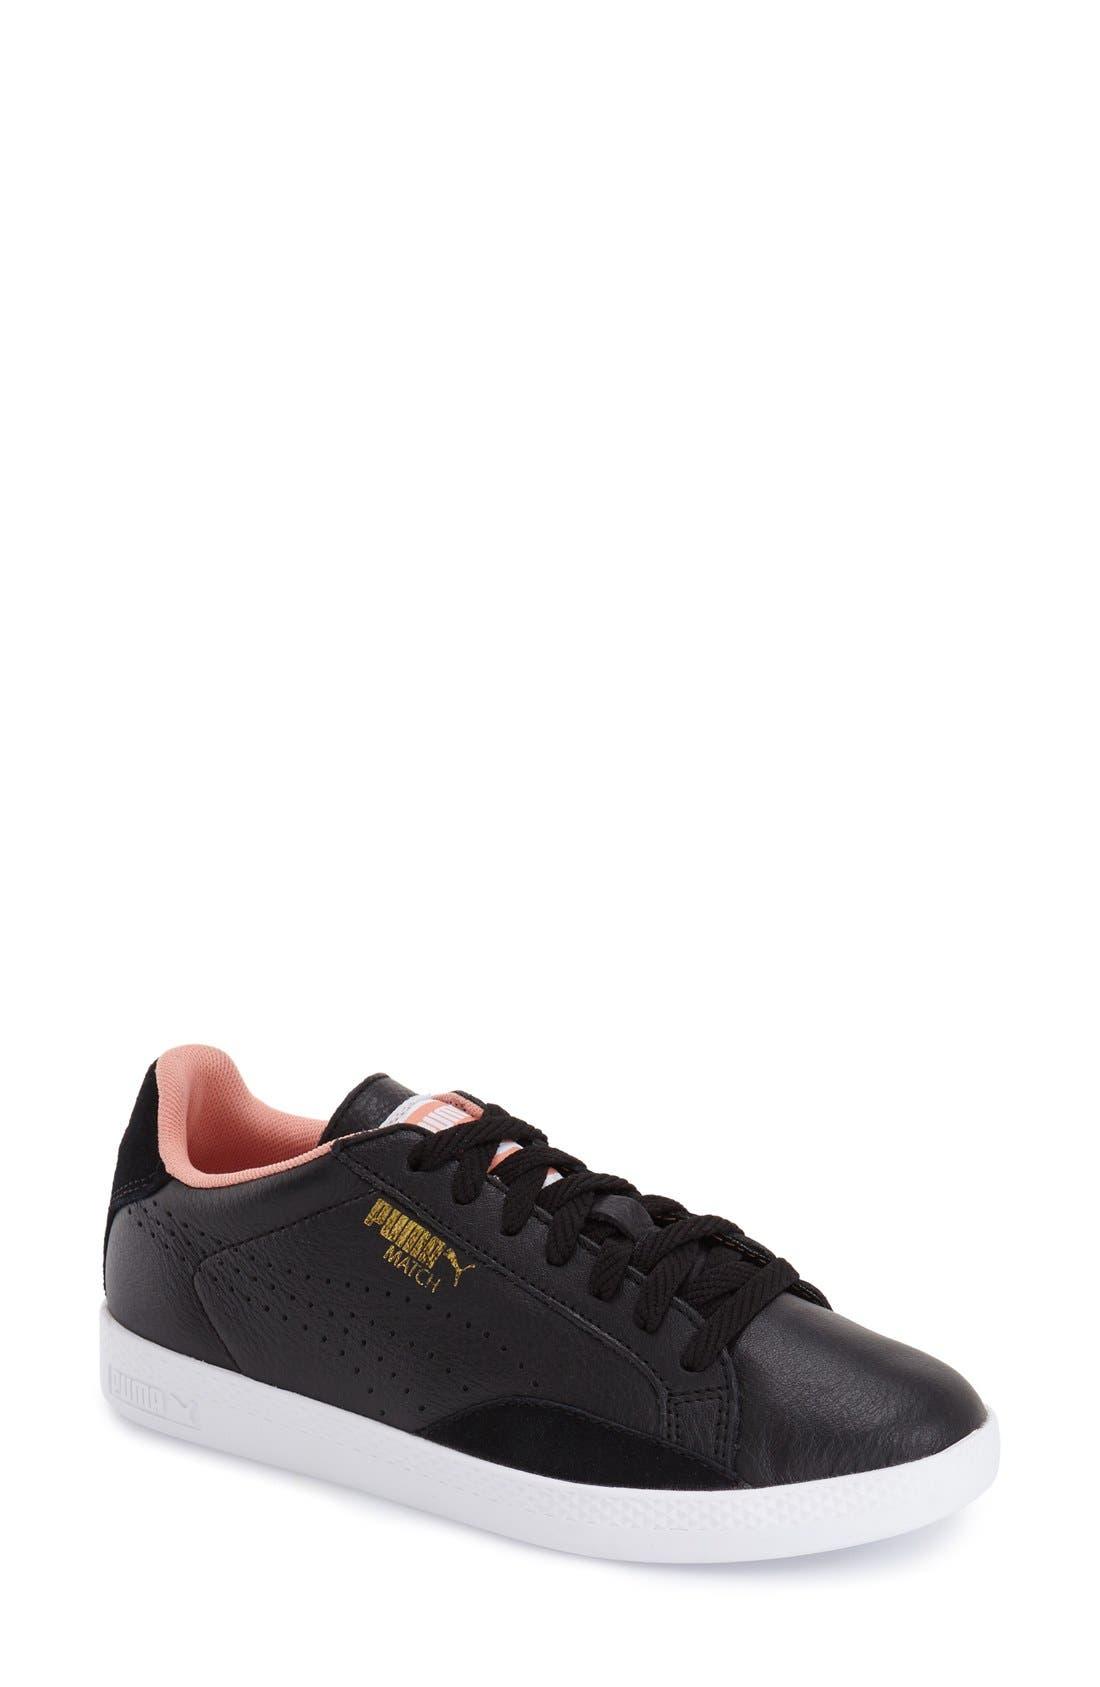 Alternate Image 1 Selected - PUMA 'Match Lo - Basic Sport' Leather Sneaker (Women)